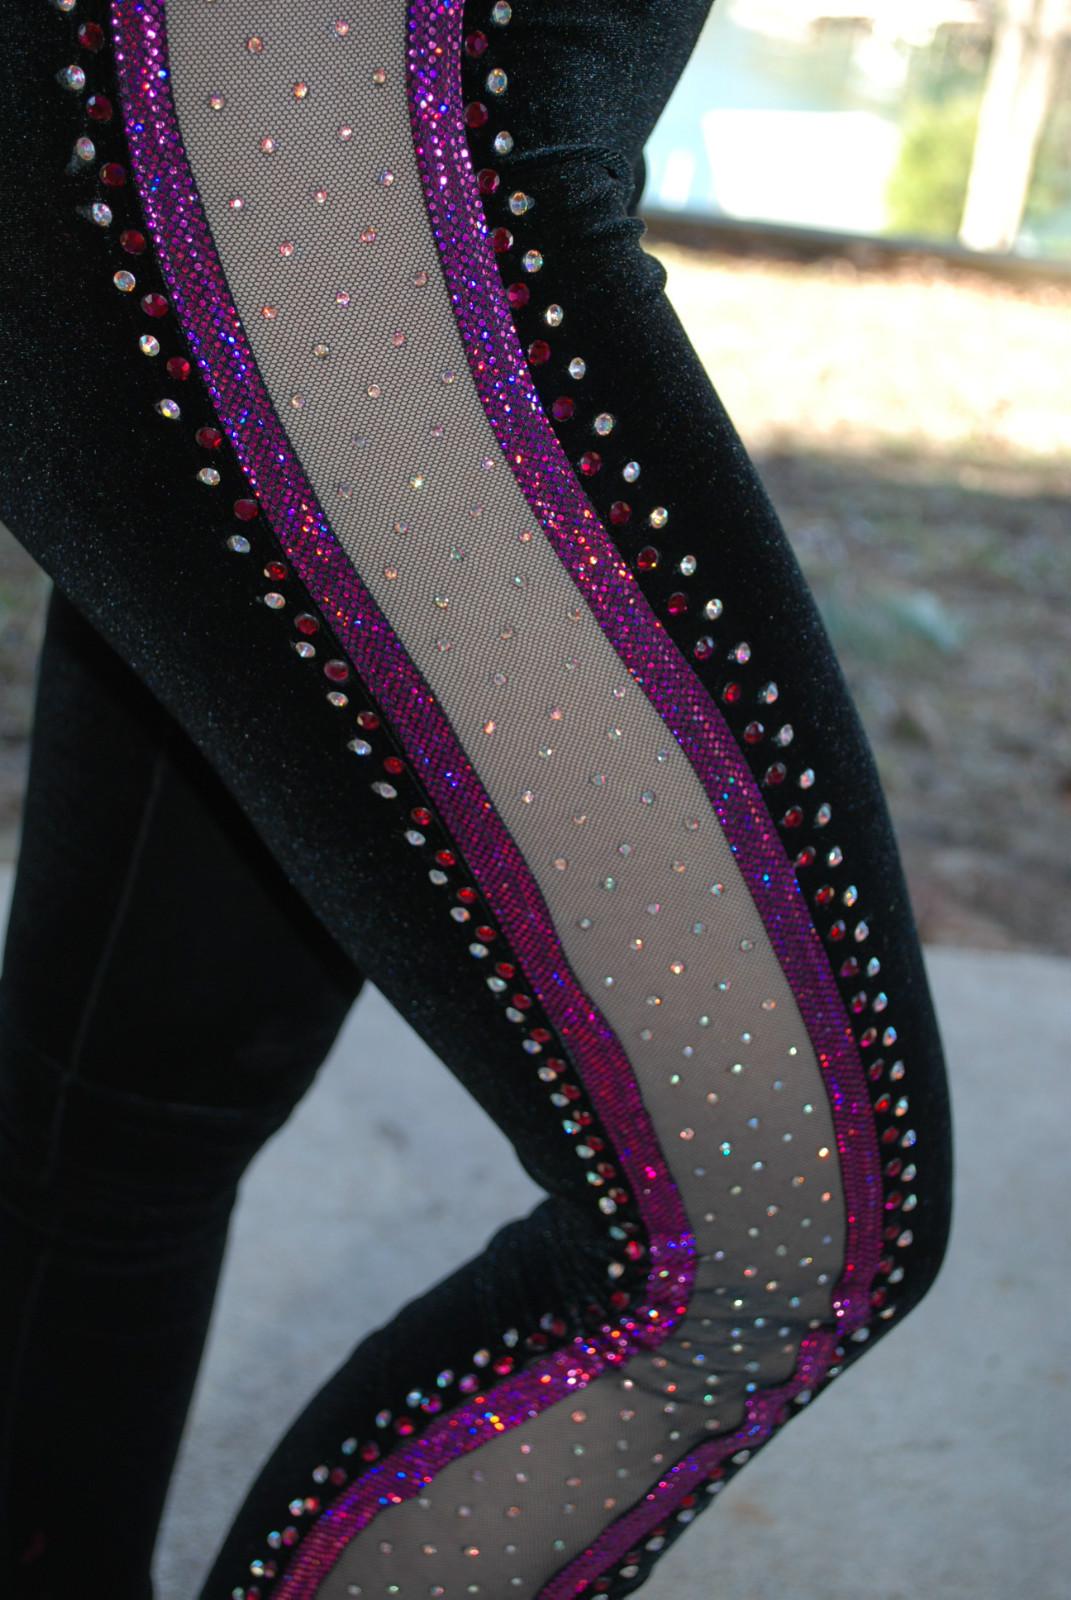 Black and Magenta Custom Competition Dance Costume AXS s Lots of Rhinestones   eBay